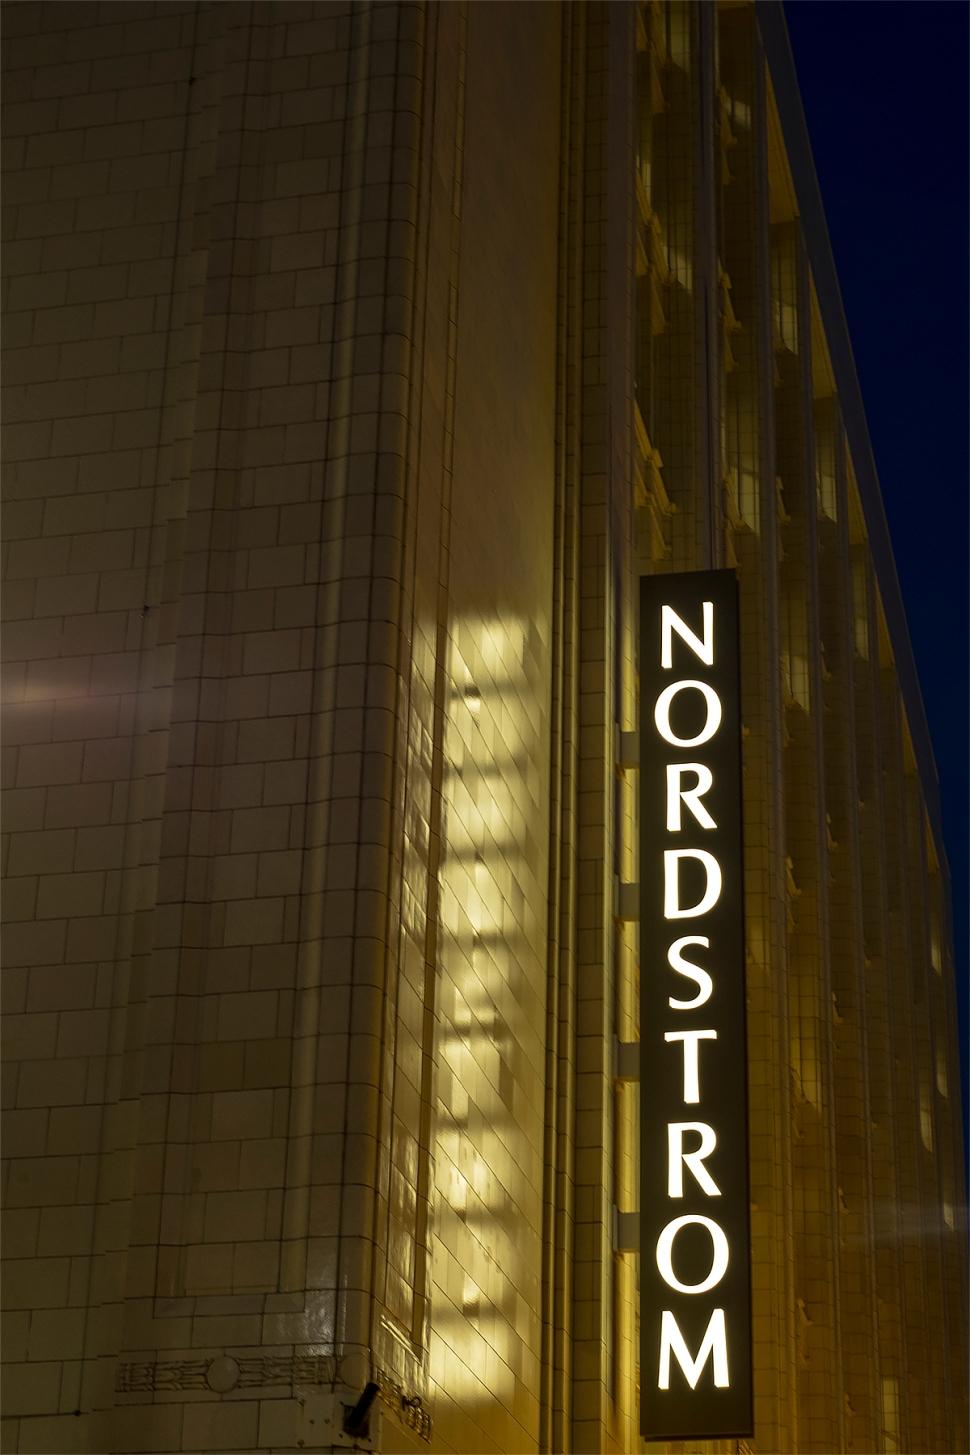 nordstrom_dscf7990